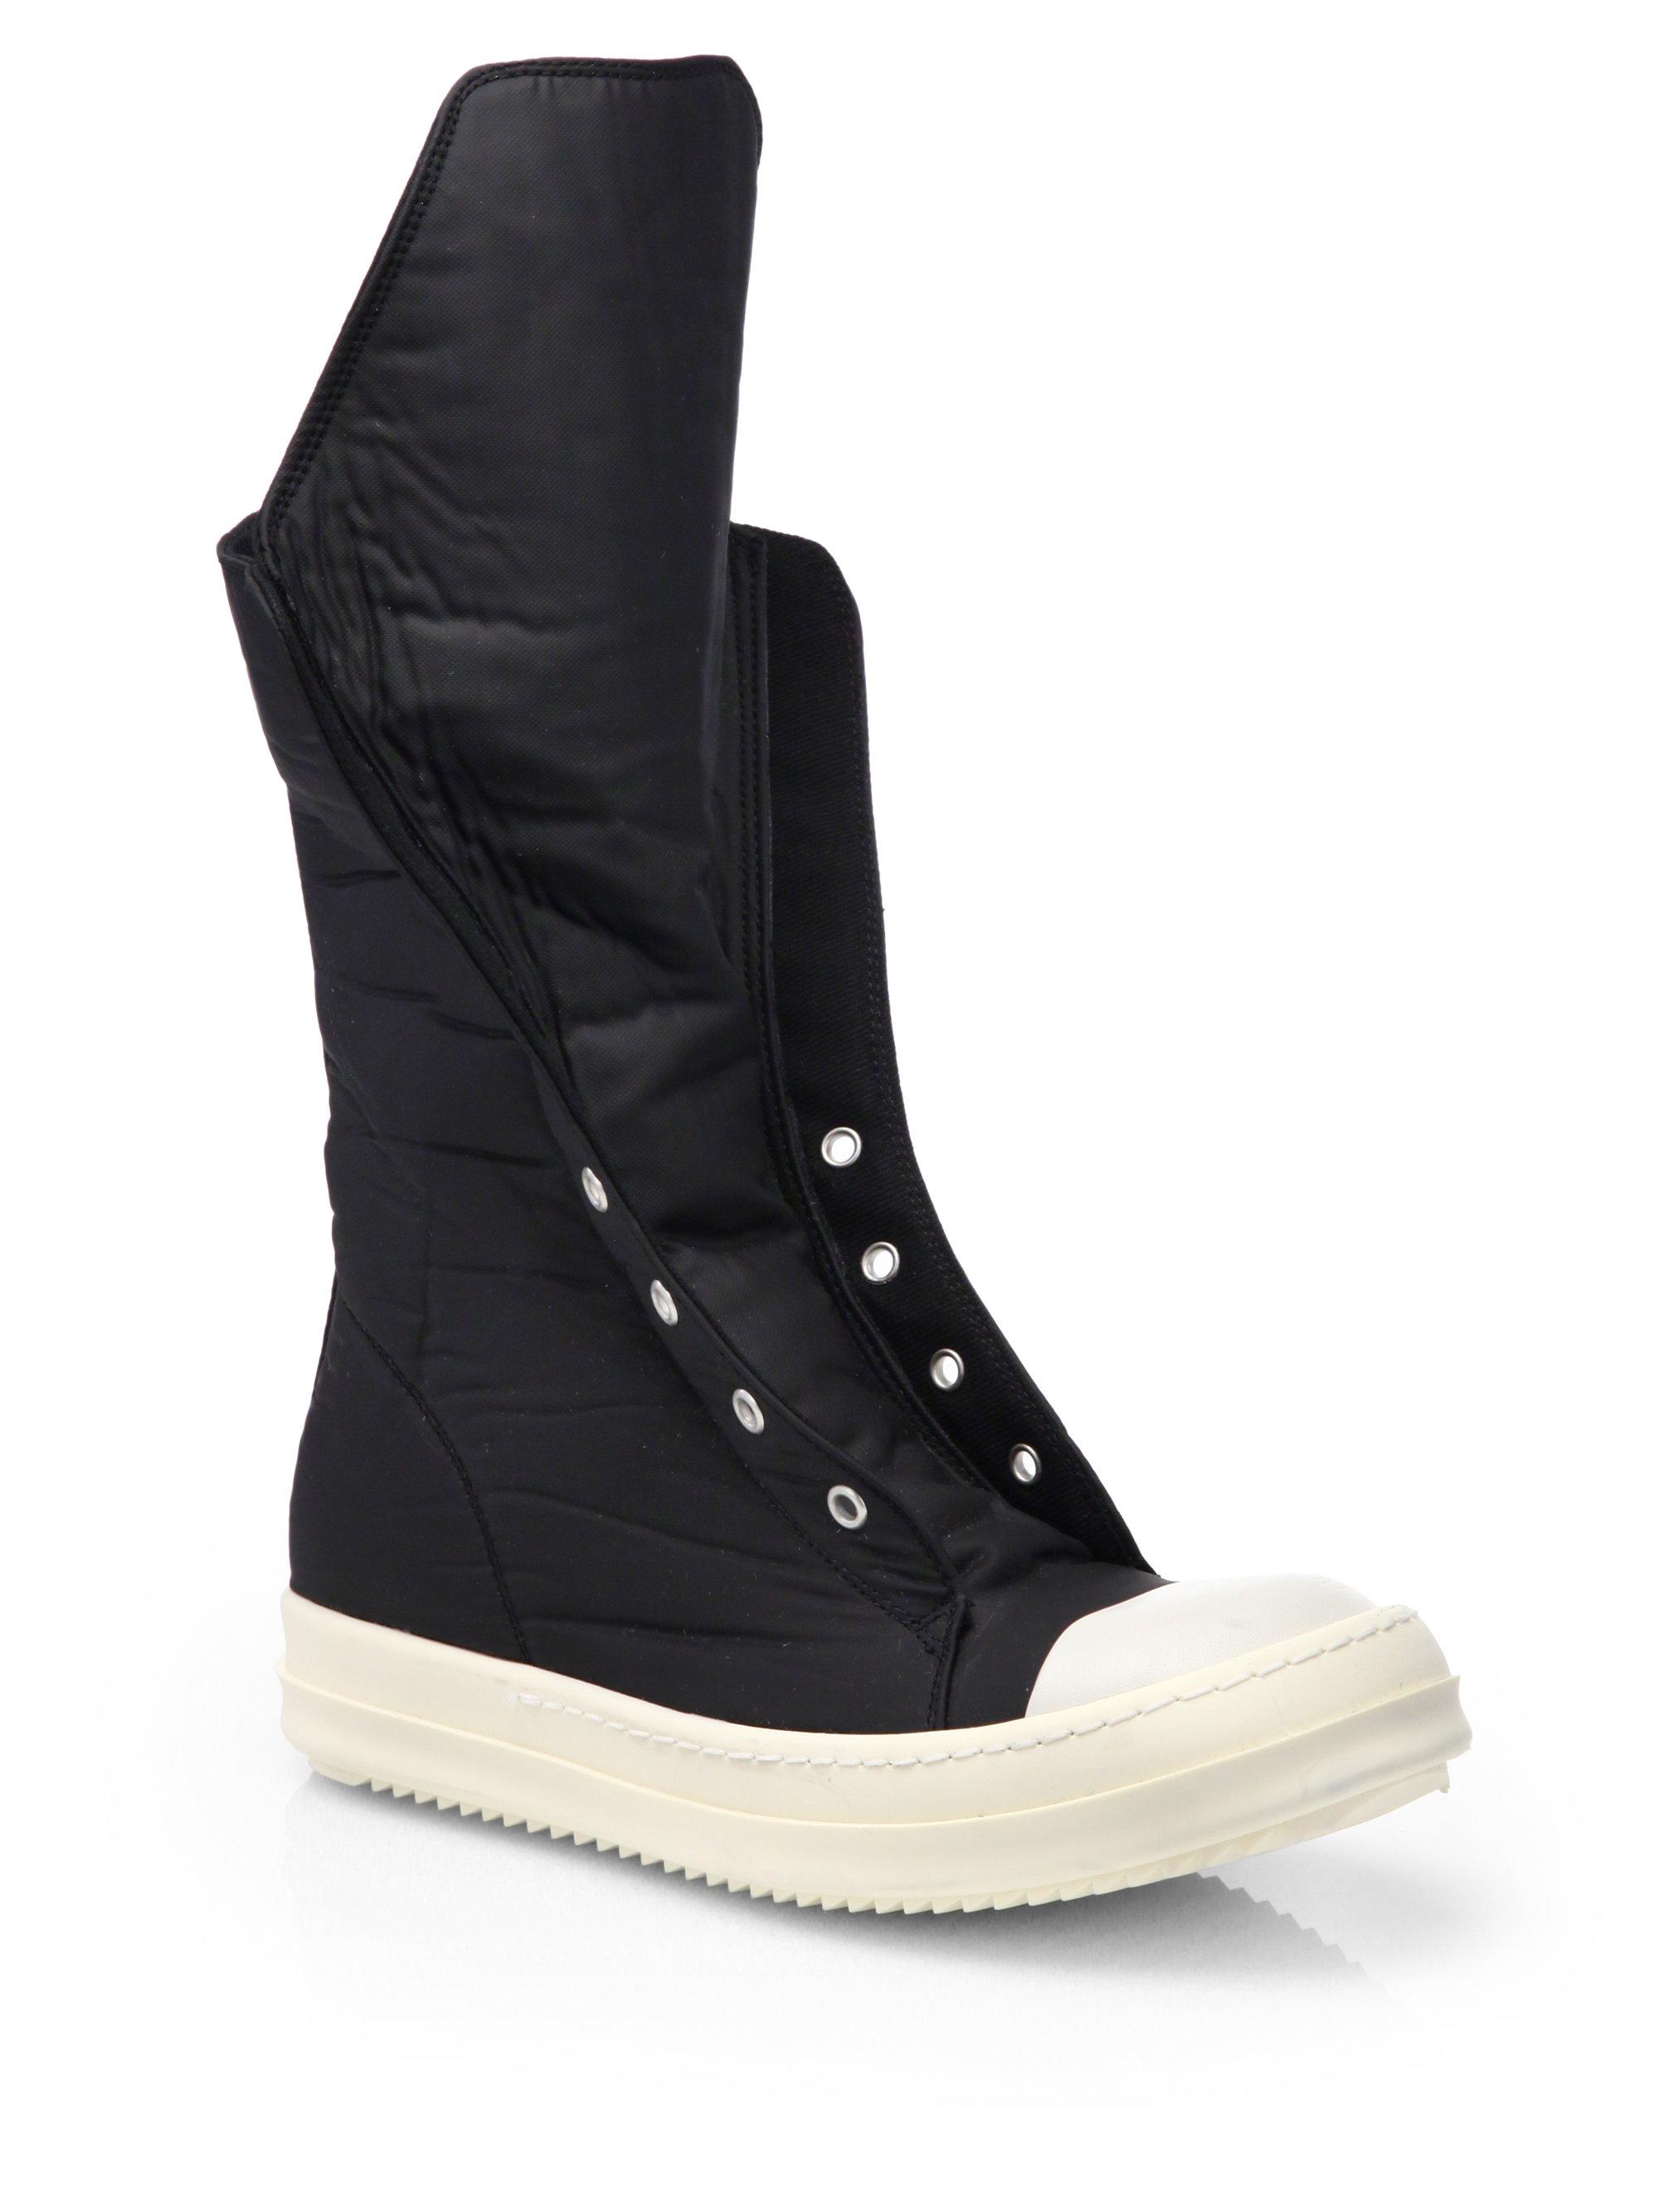 Lyst Drkshdw By Rick Owens Ramones Hightop Sneaker Boots